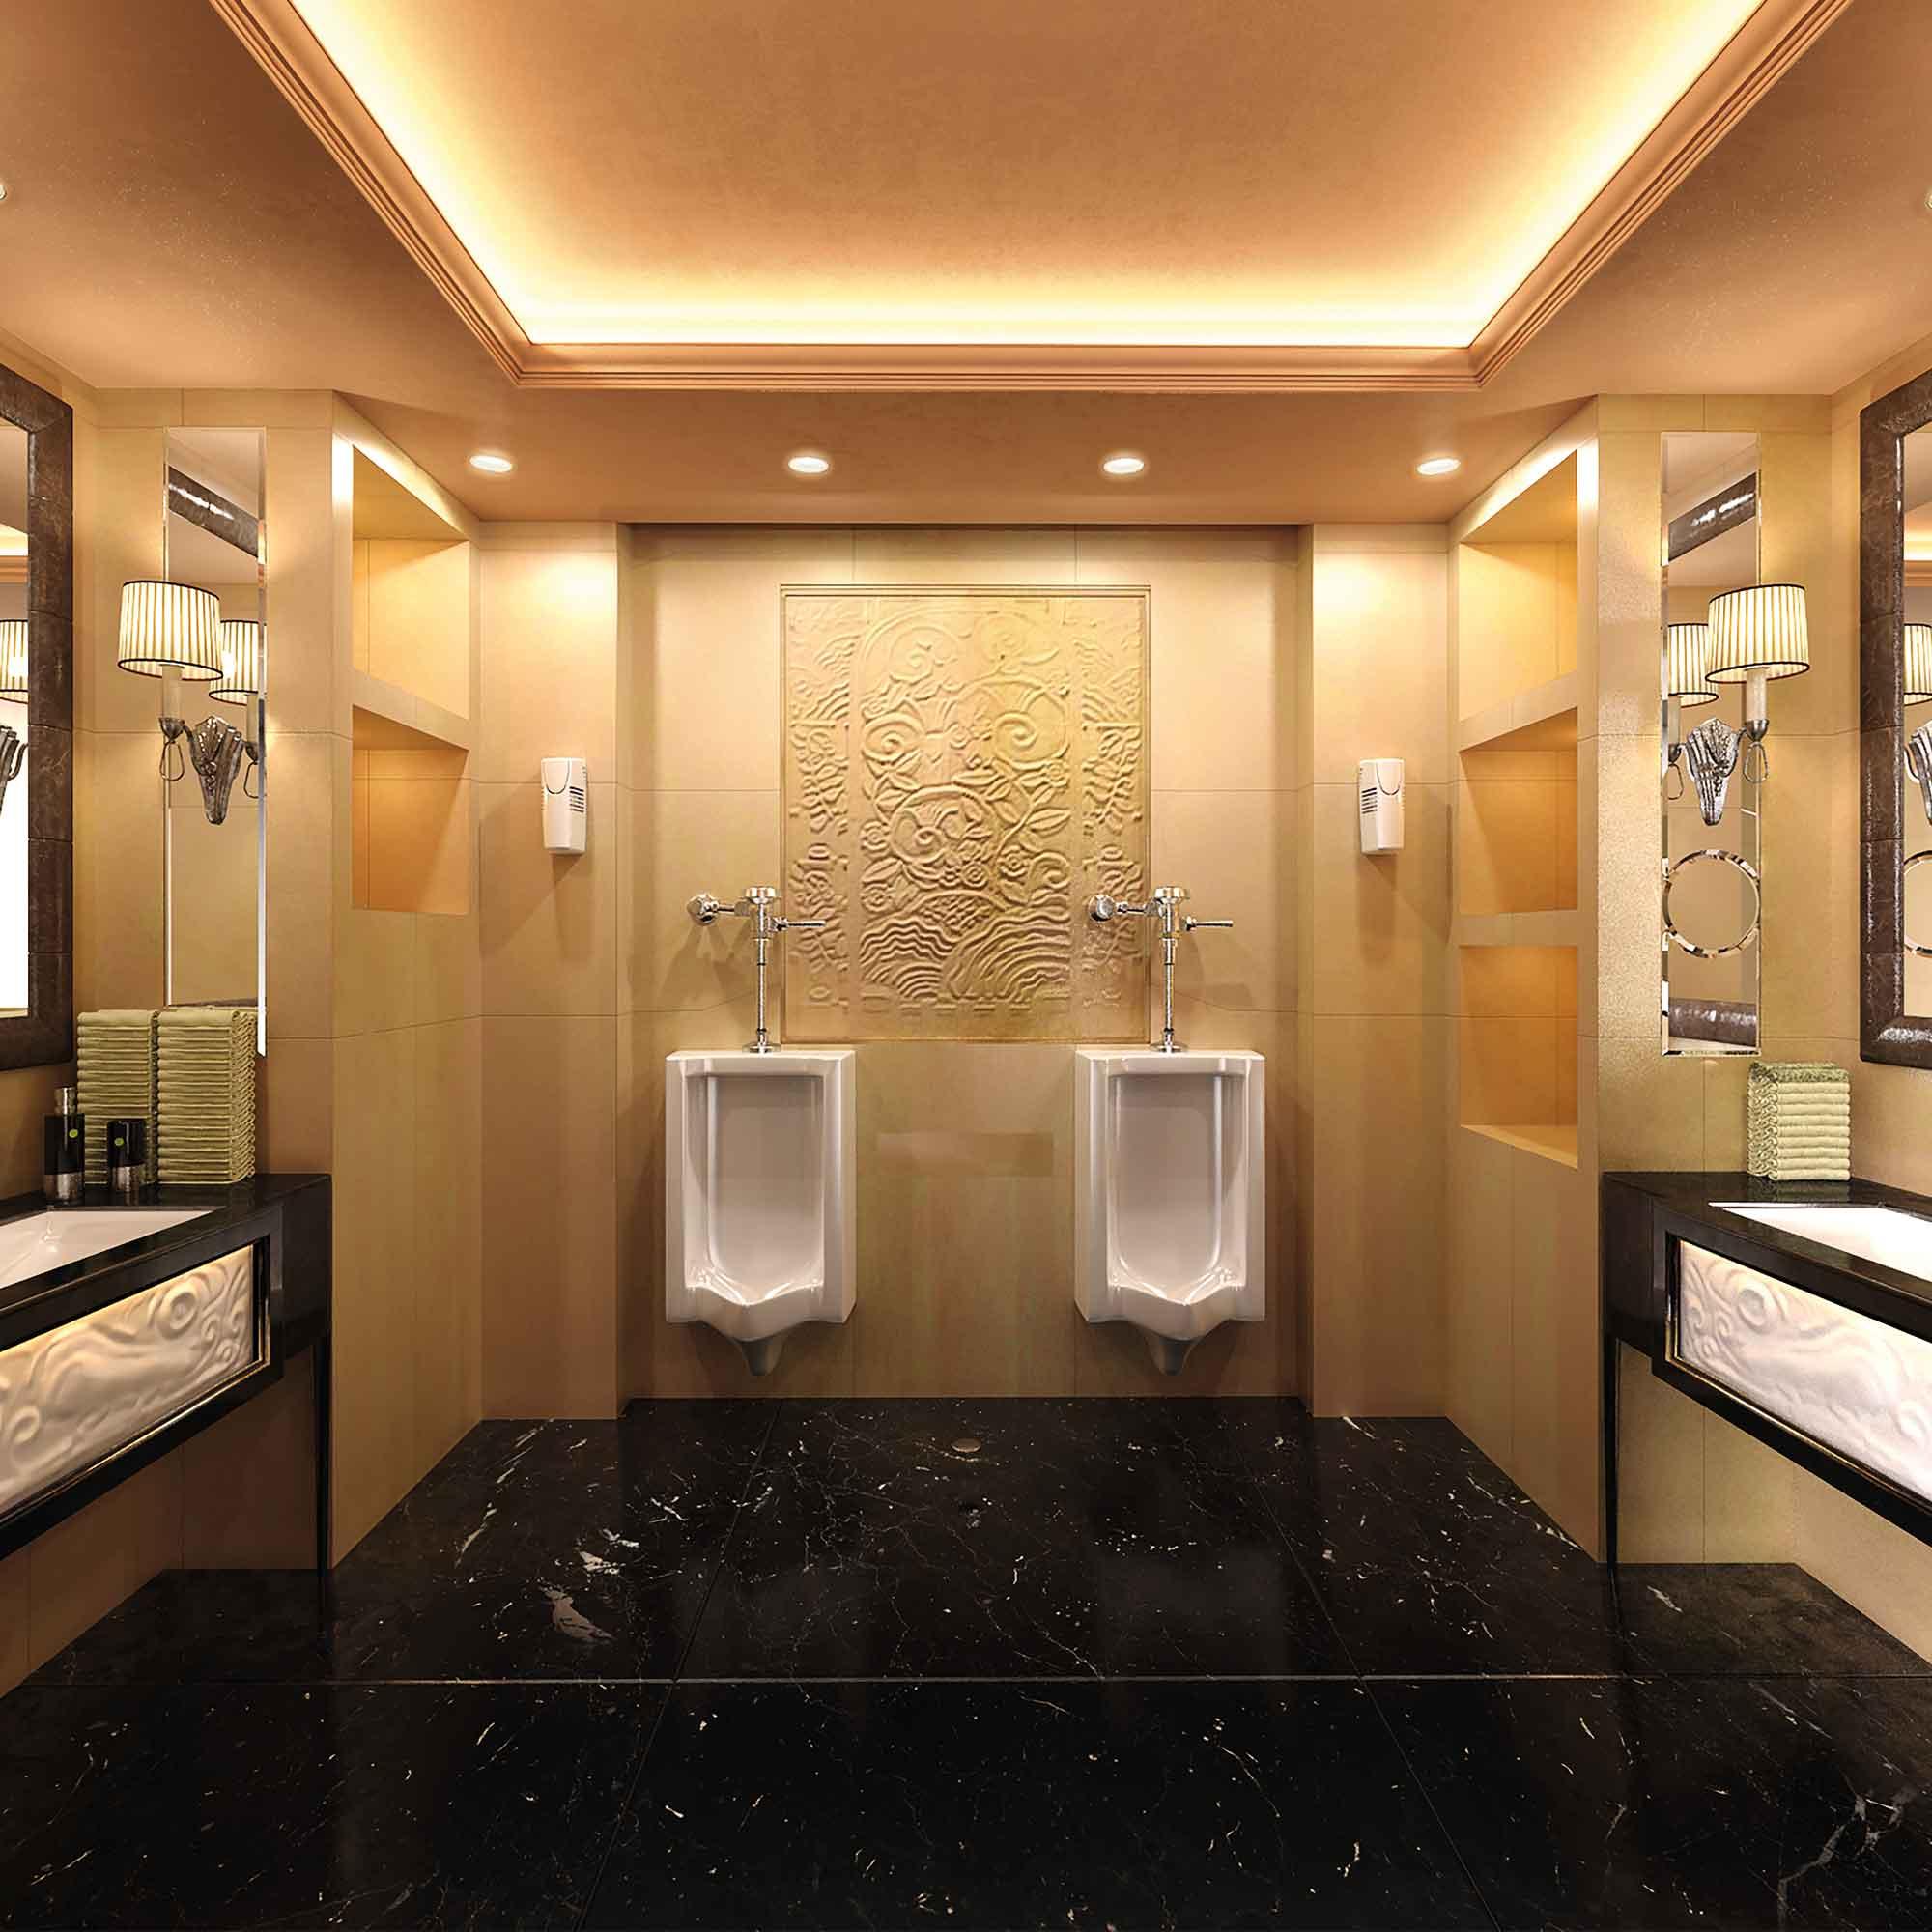 V-Air SOLID in Washroom